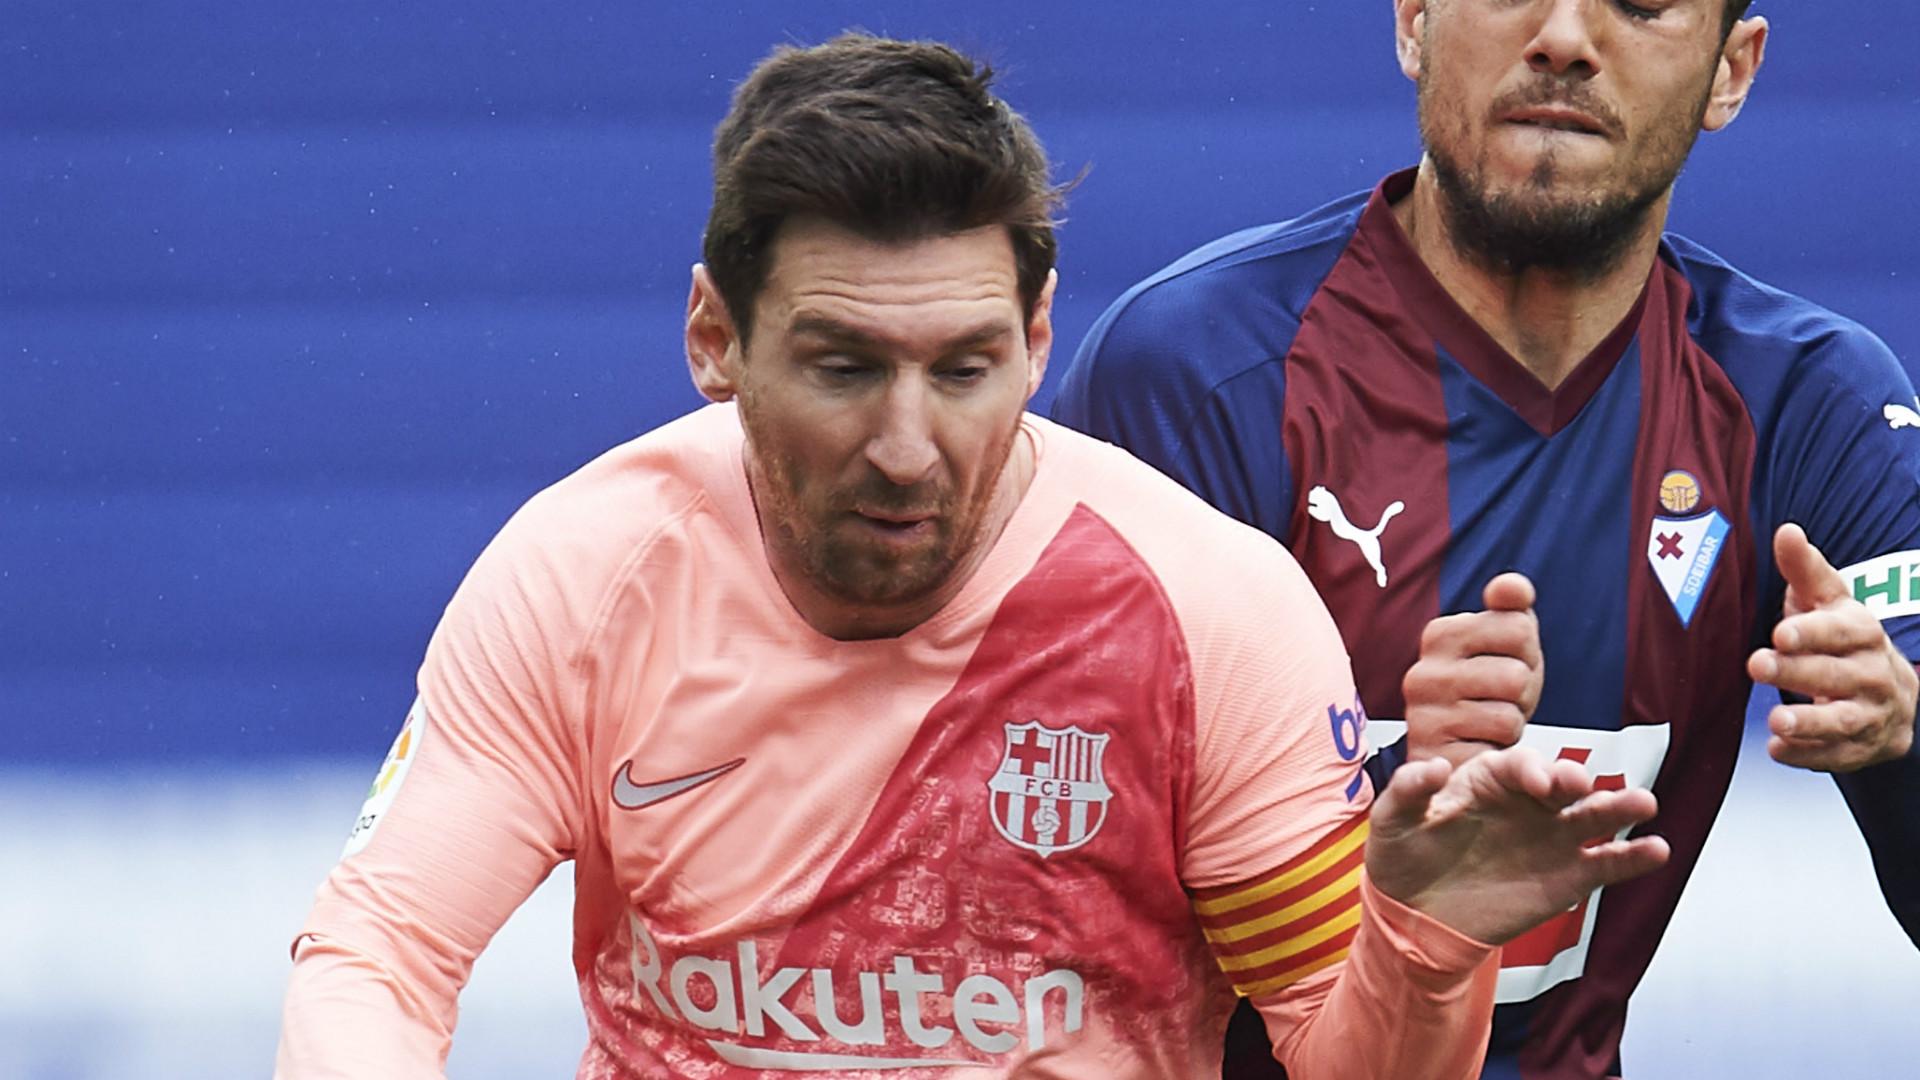 Video: Messi is more worried about team despite goal-scoring titles - Valverde